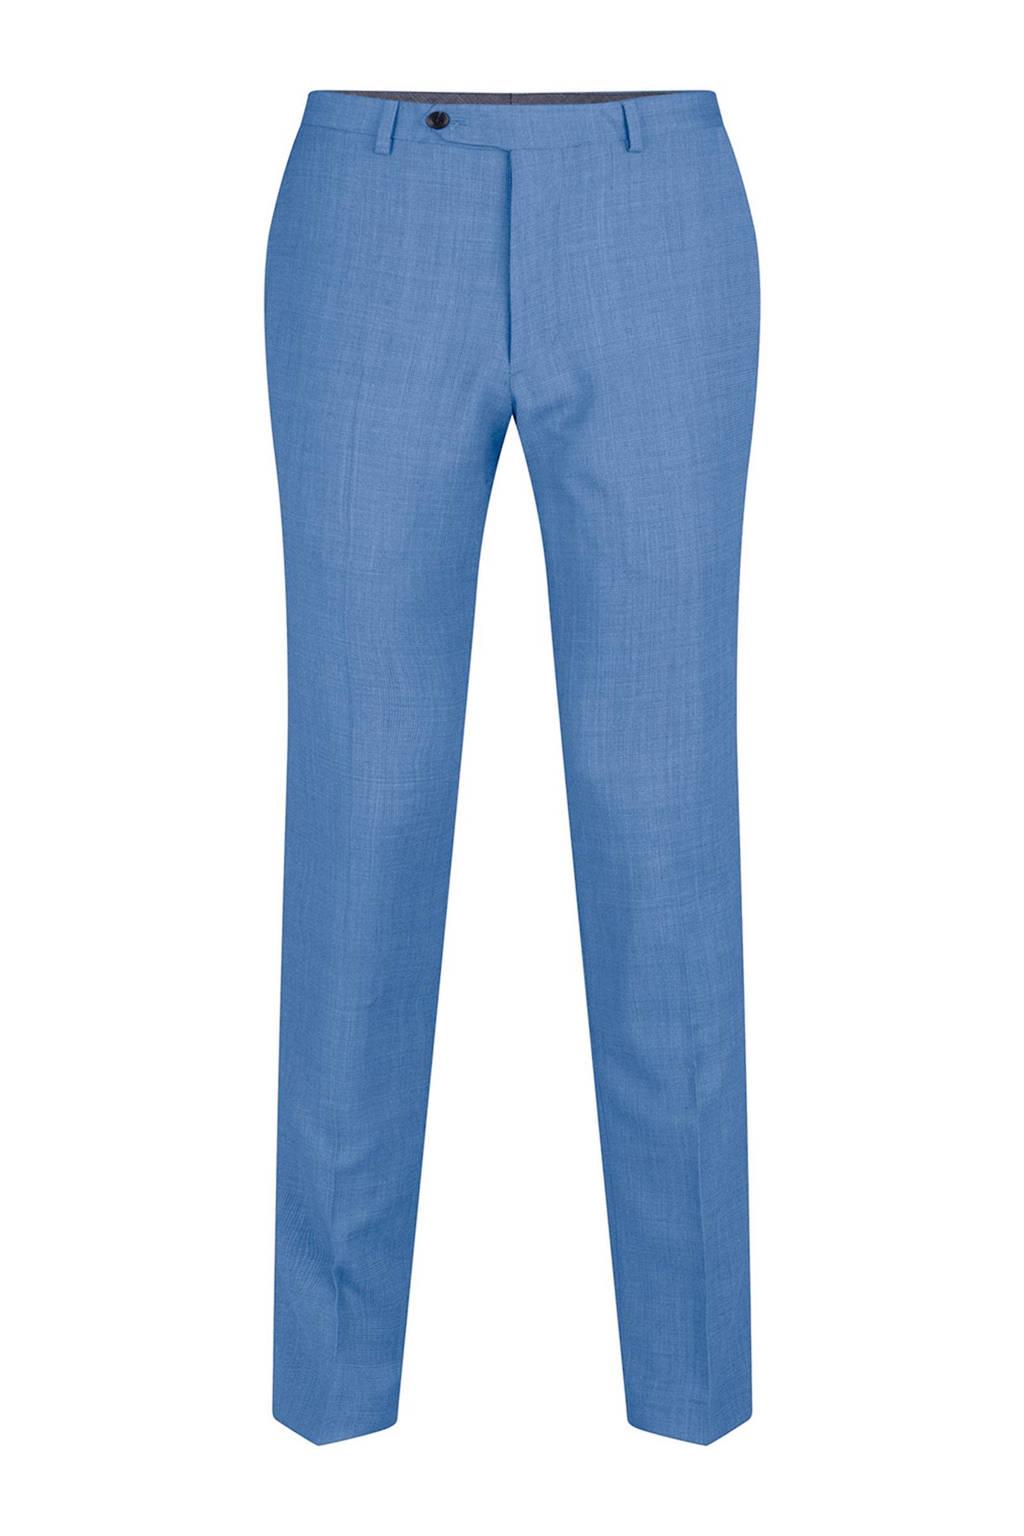 WE Fashion x Van Gils slim fit pantalon met wol, Lichtblauw